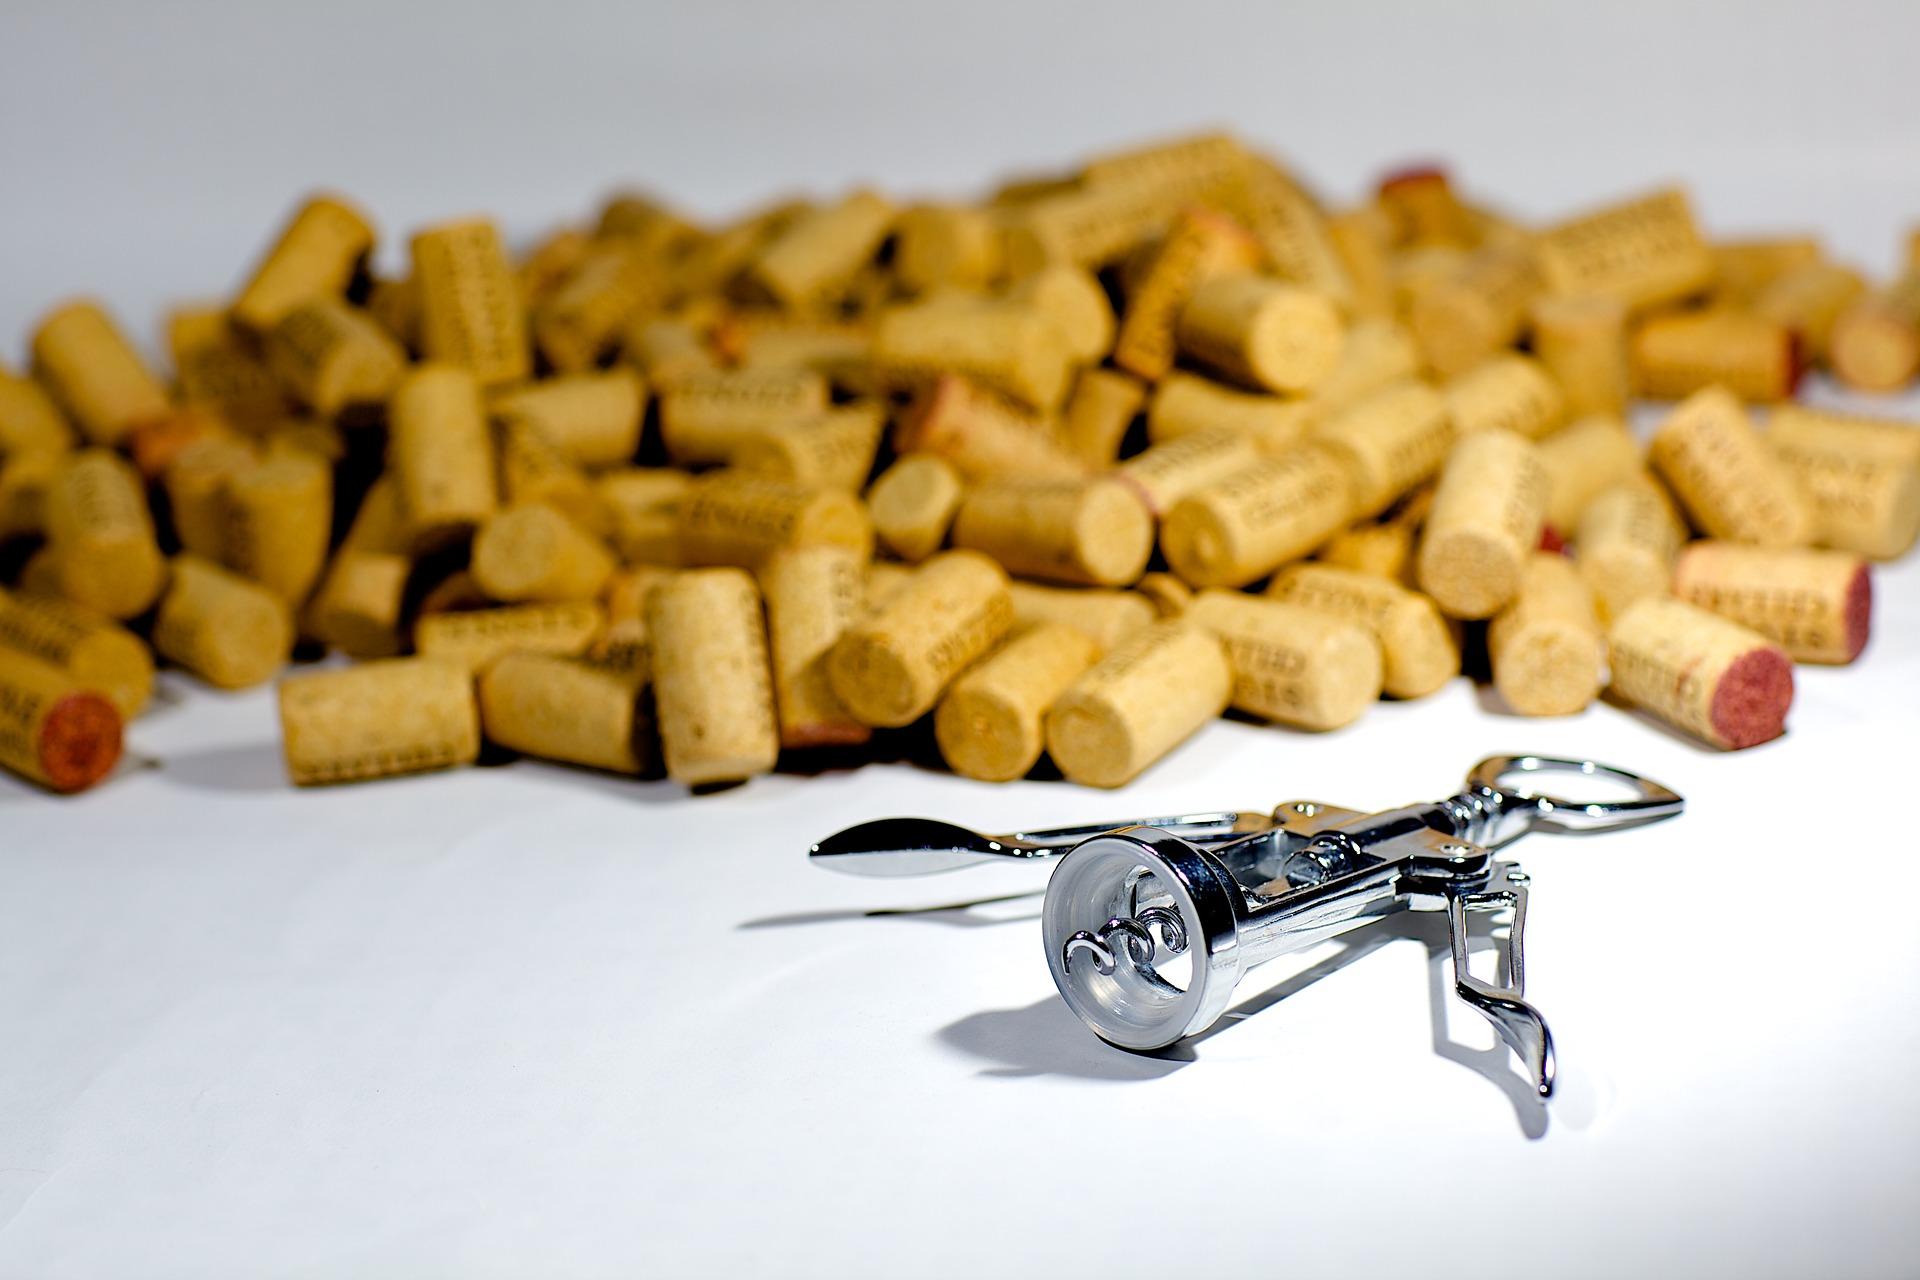 corks-640362_1920.jpg